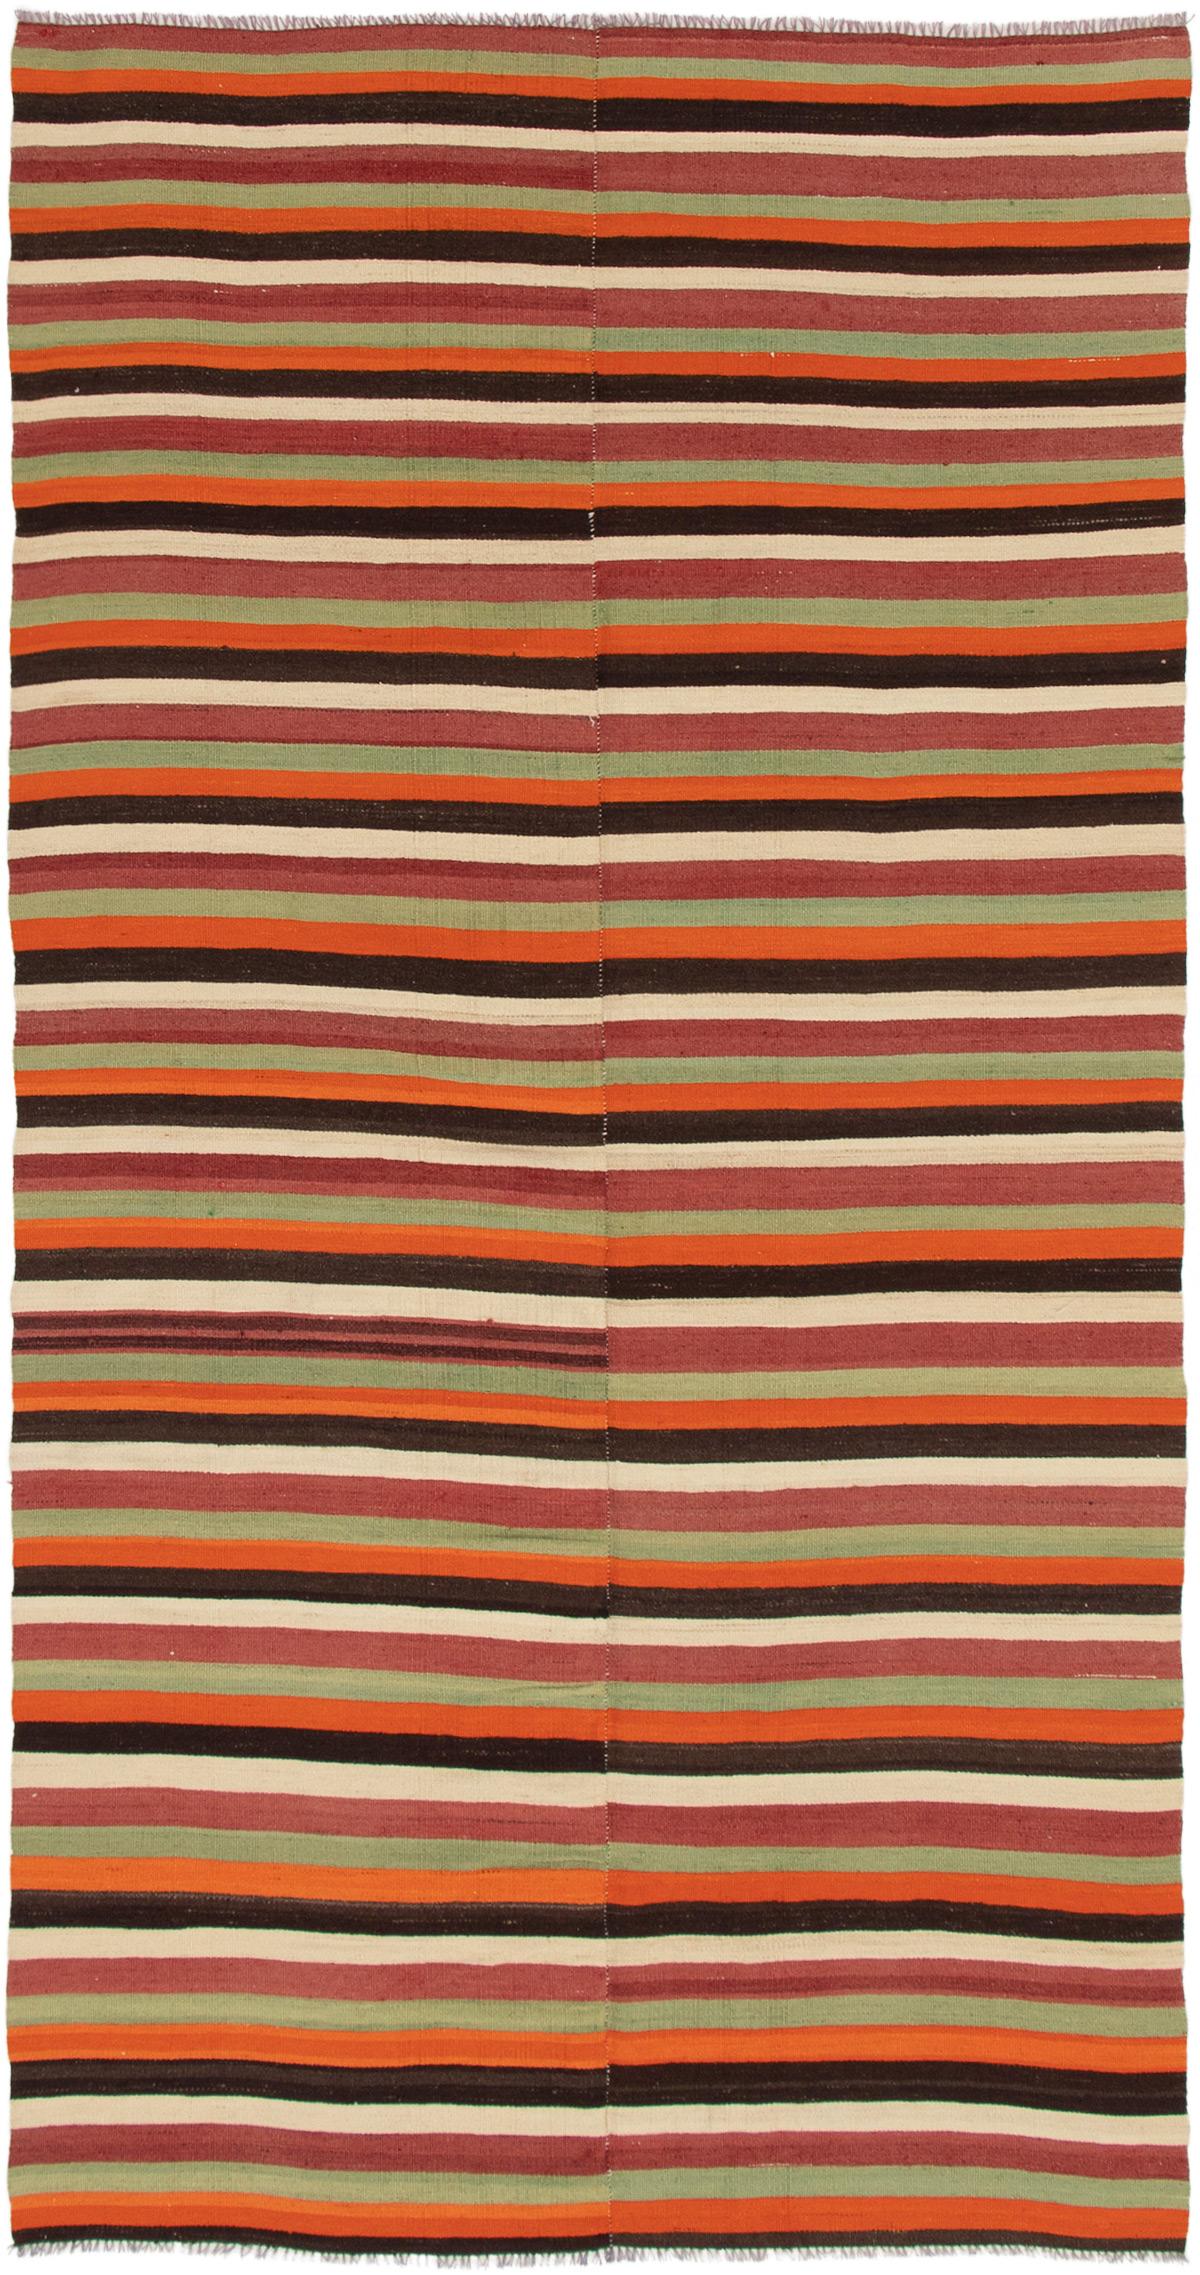 "Hand woven Bohemian Orange Wool Kilim 4'10"" x 9'4"" Size: 4'10"" x 9'4"""